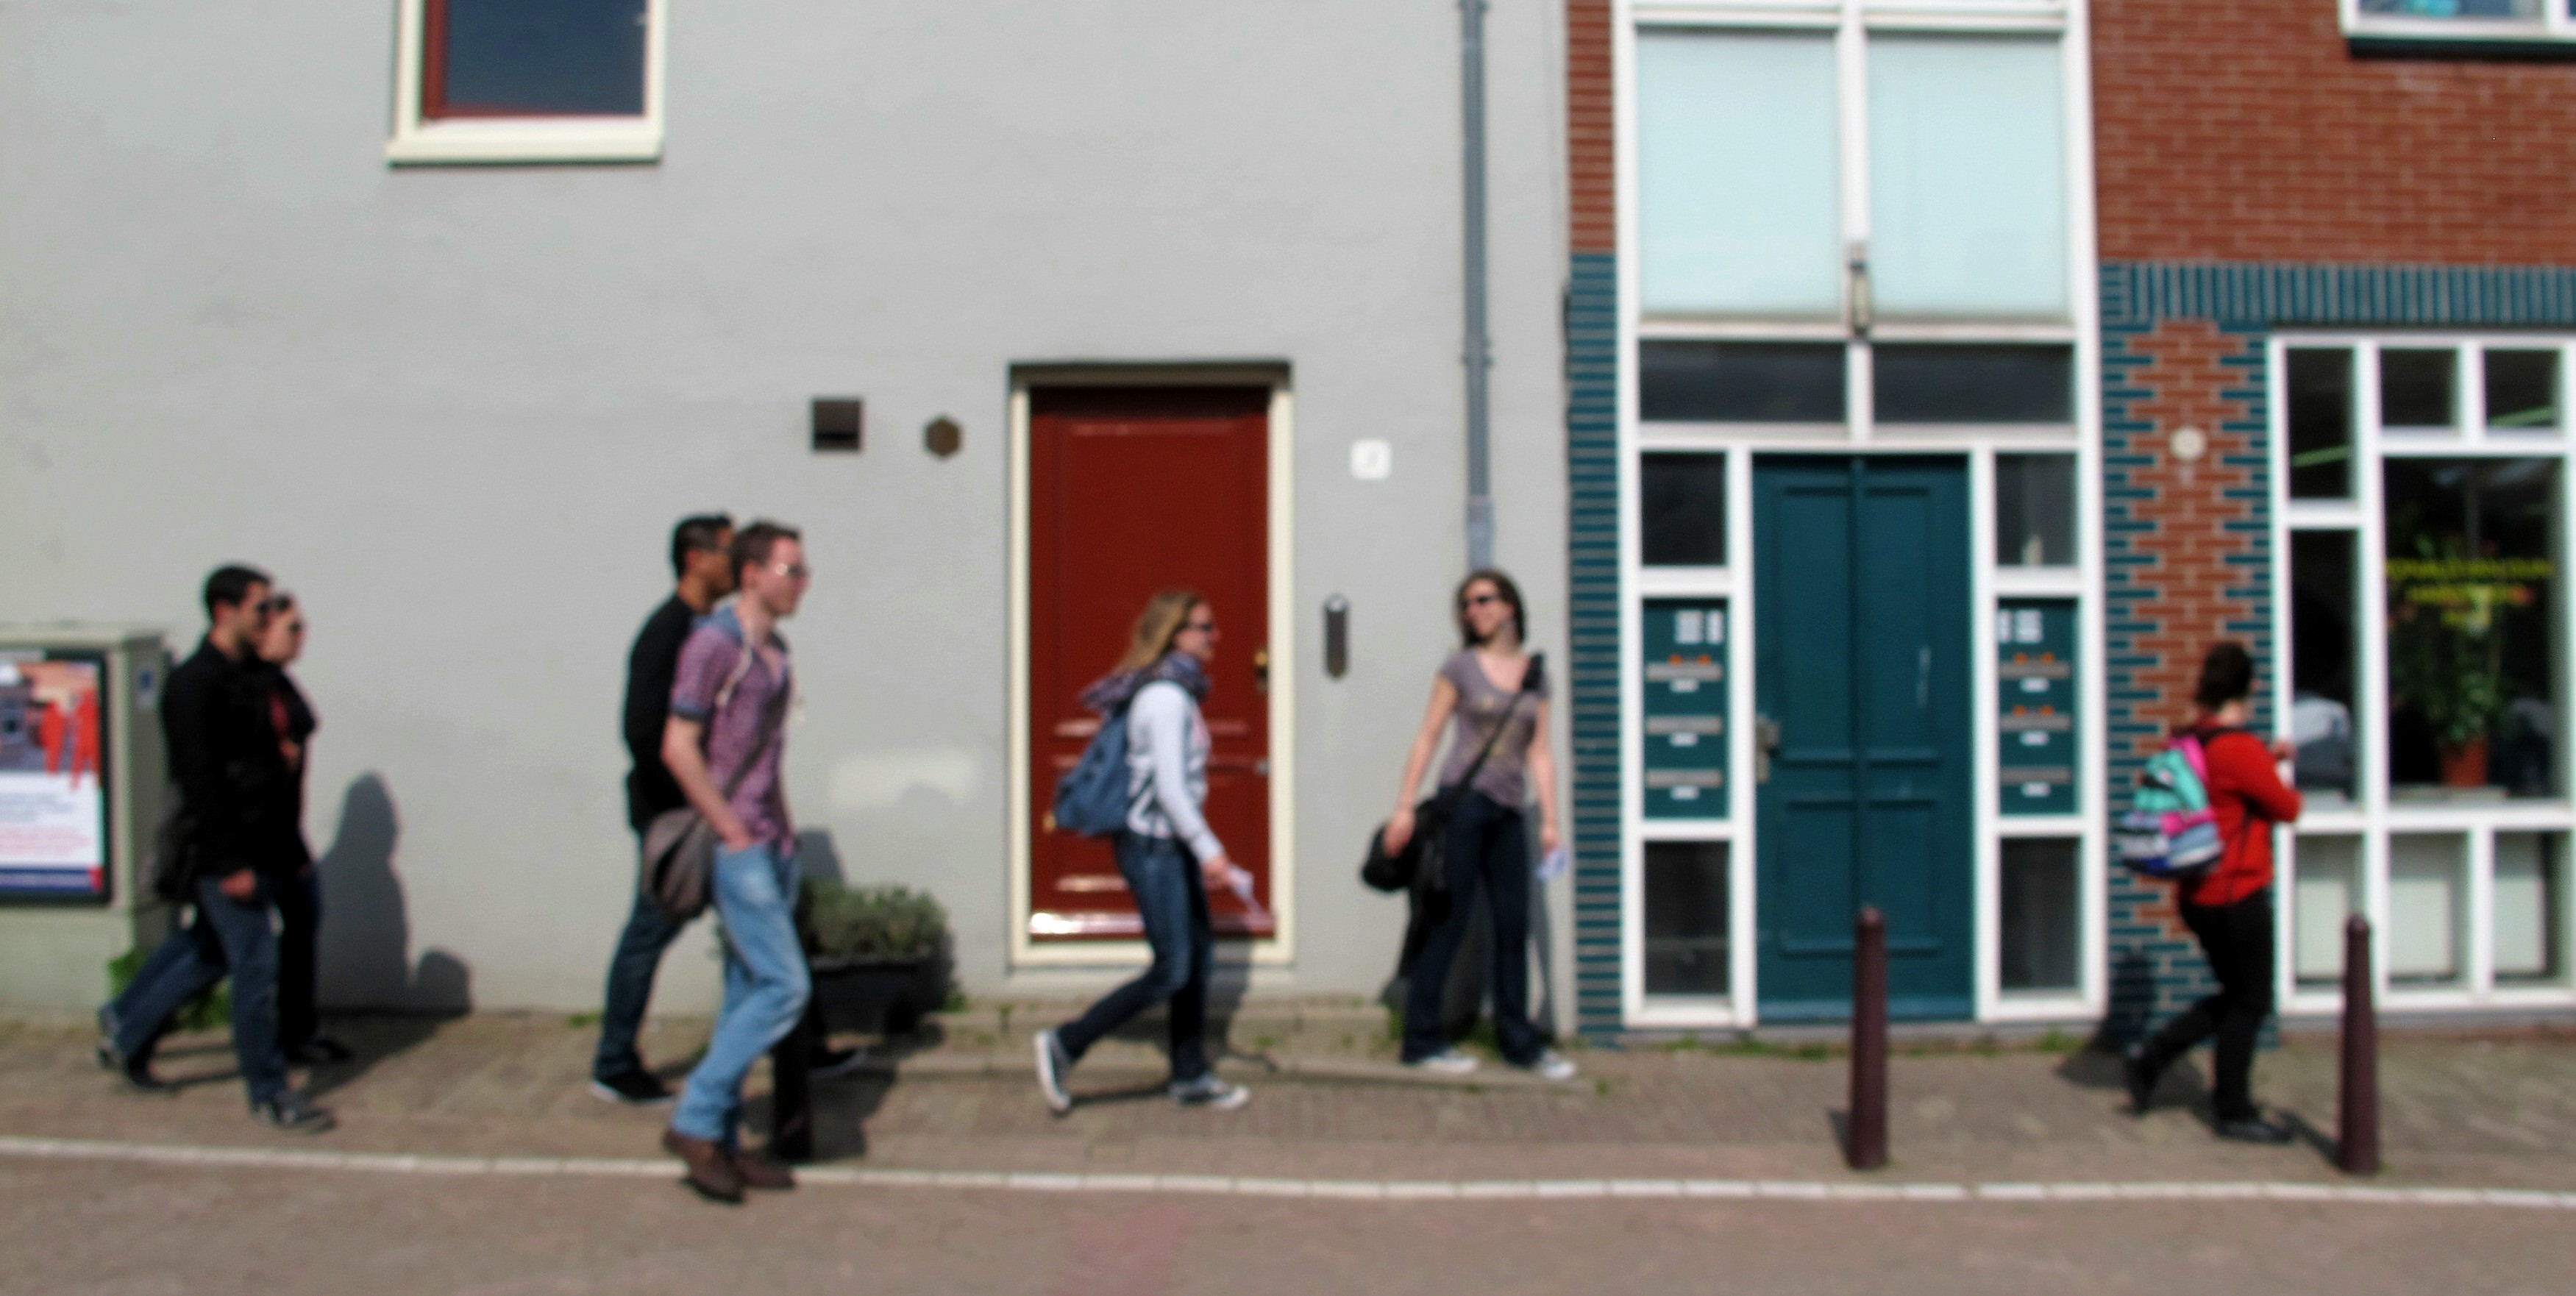 24-avril-2013-nijmegen-amsterdam-146-copie